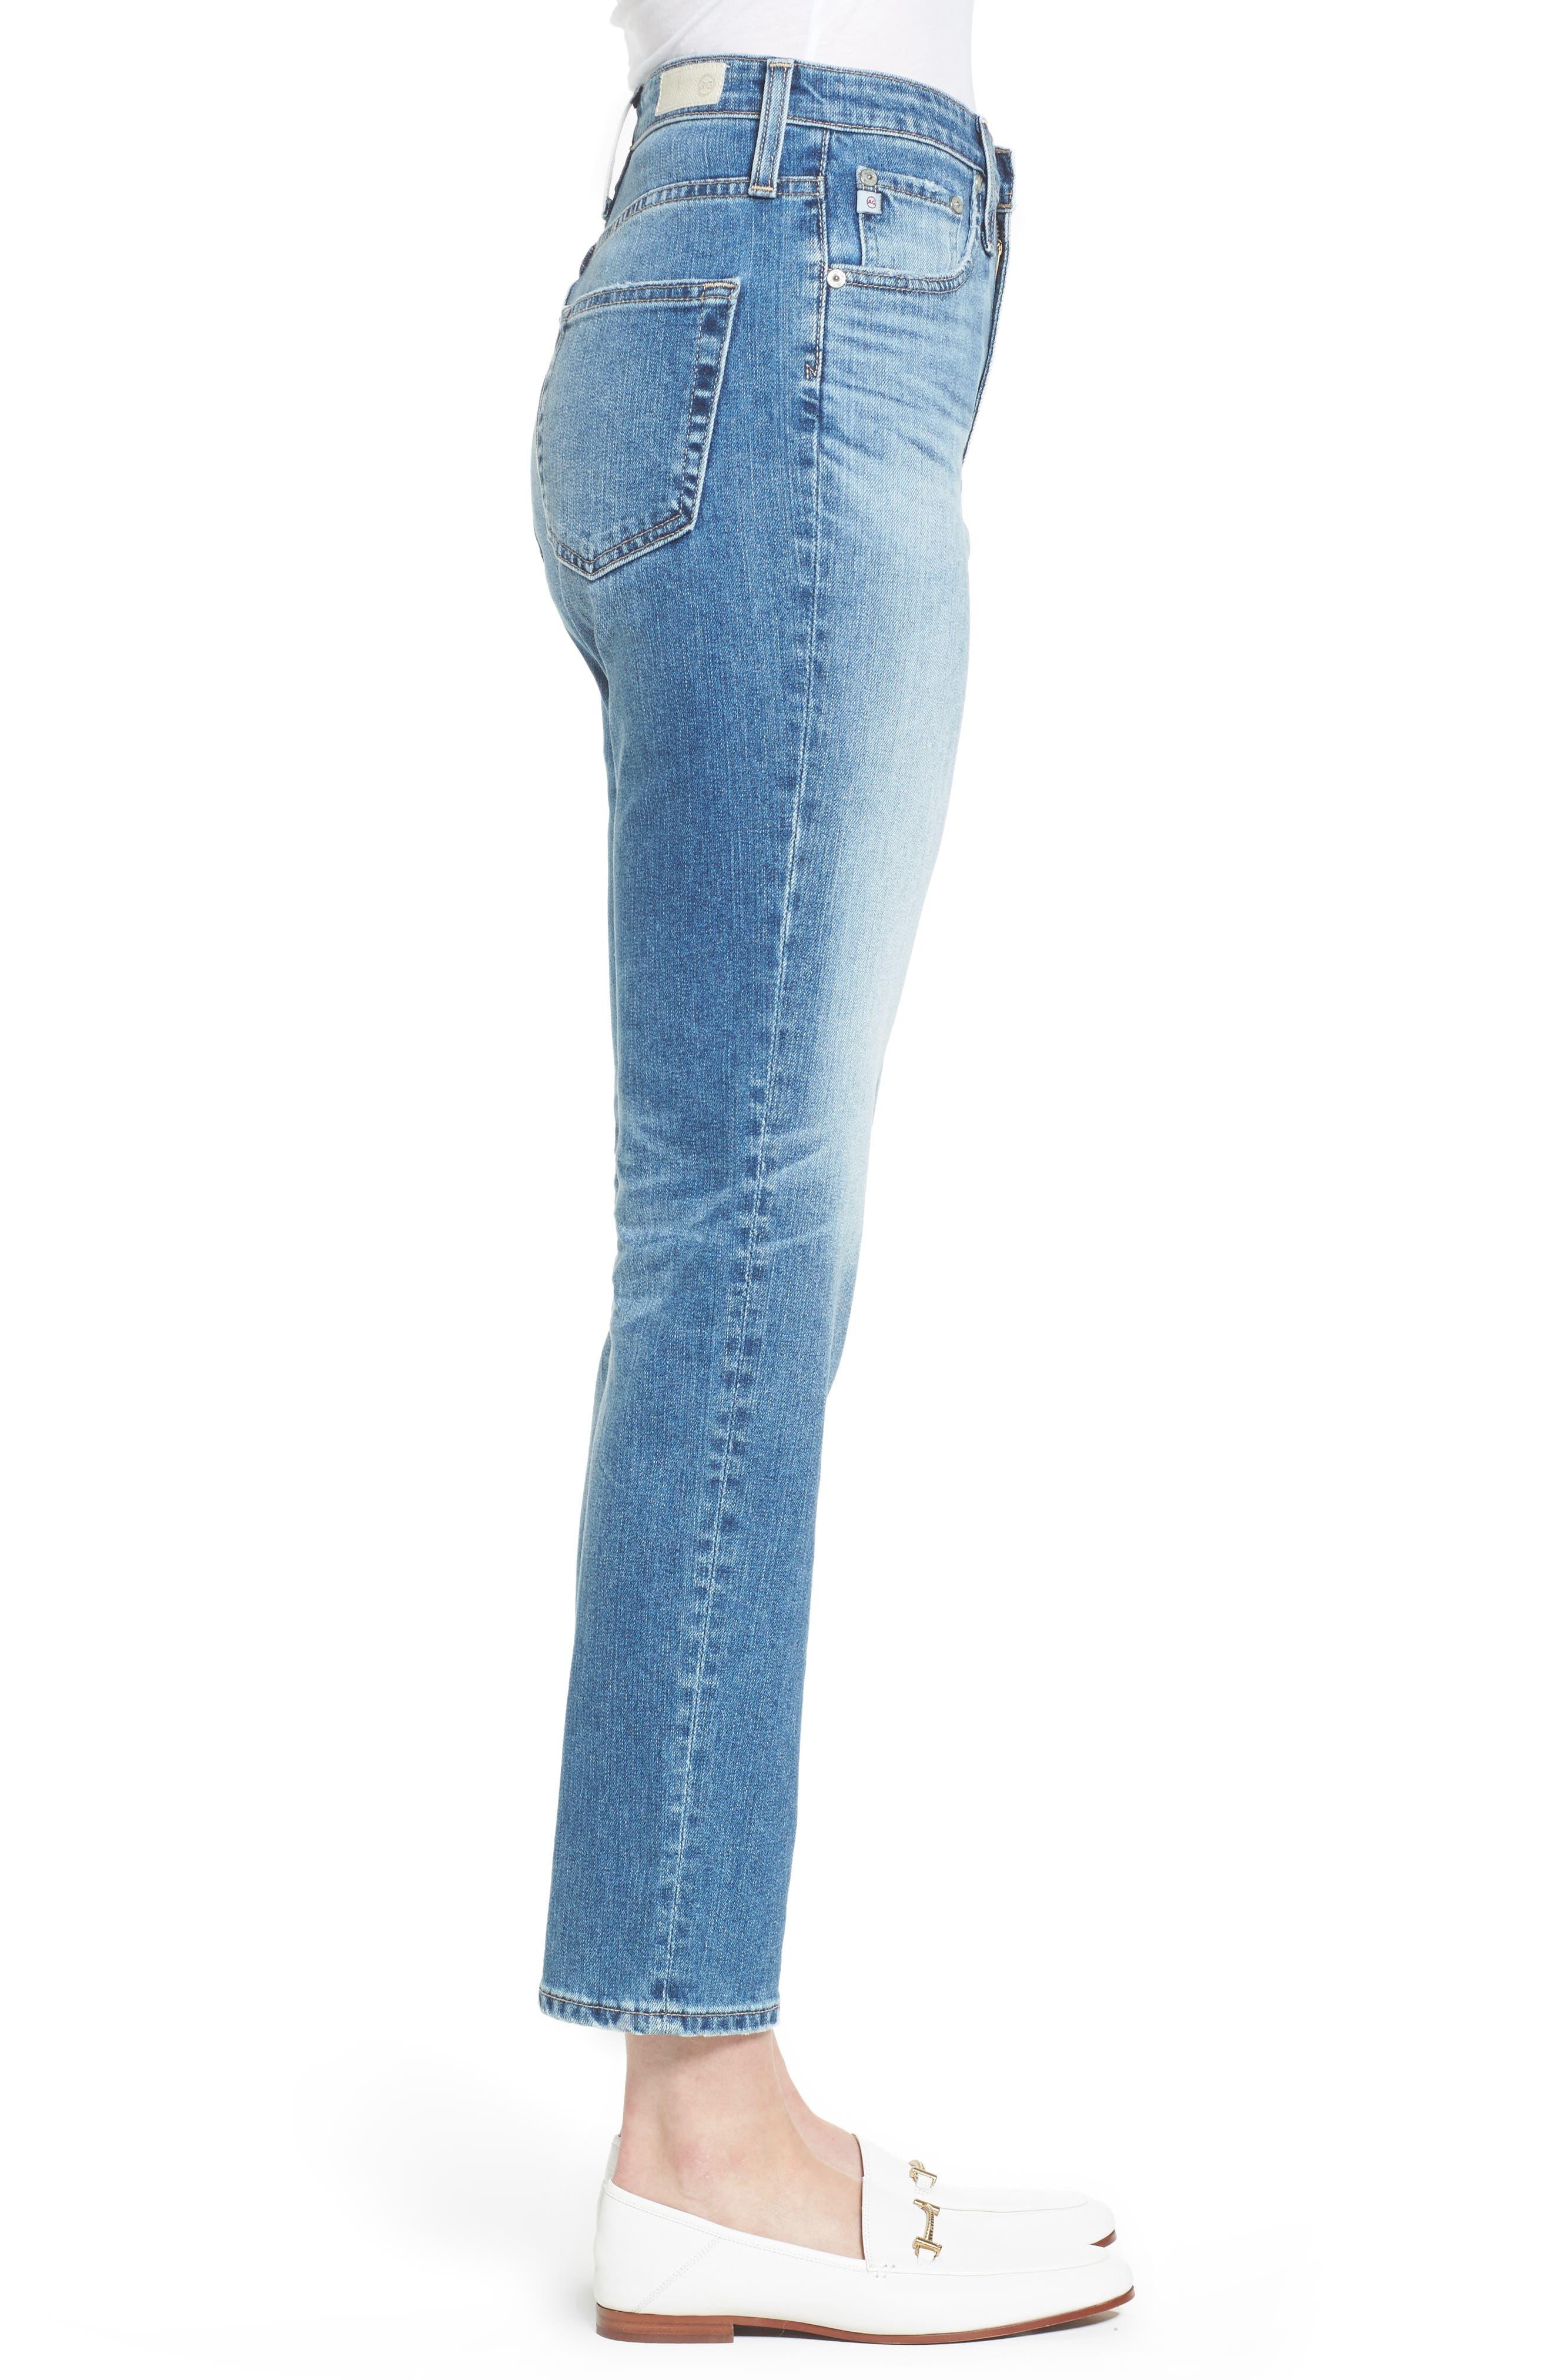 Alternate Image 3  - AG 'The Phoebe' Vintage High Rise Straight Leg Jeans (16 Years Indigo Deluge)